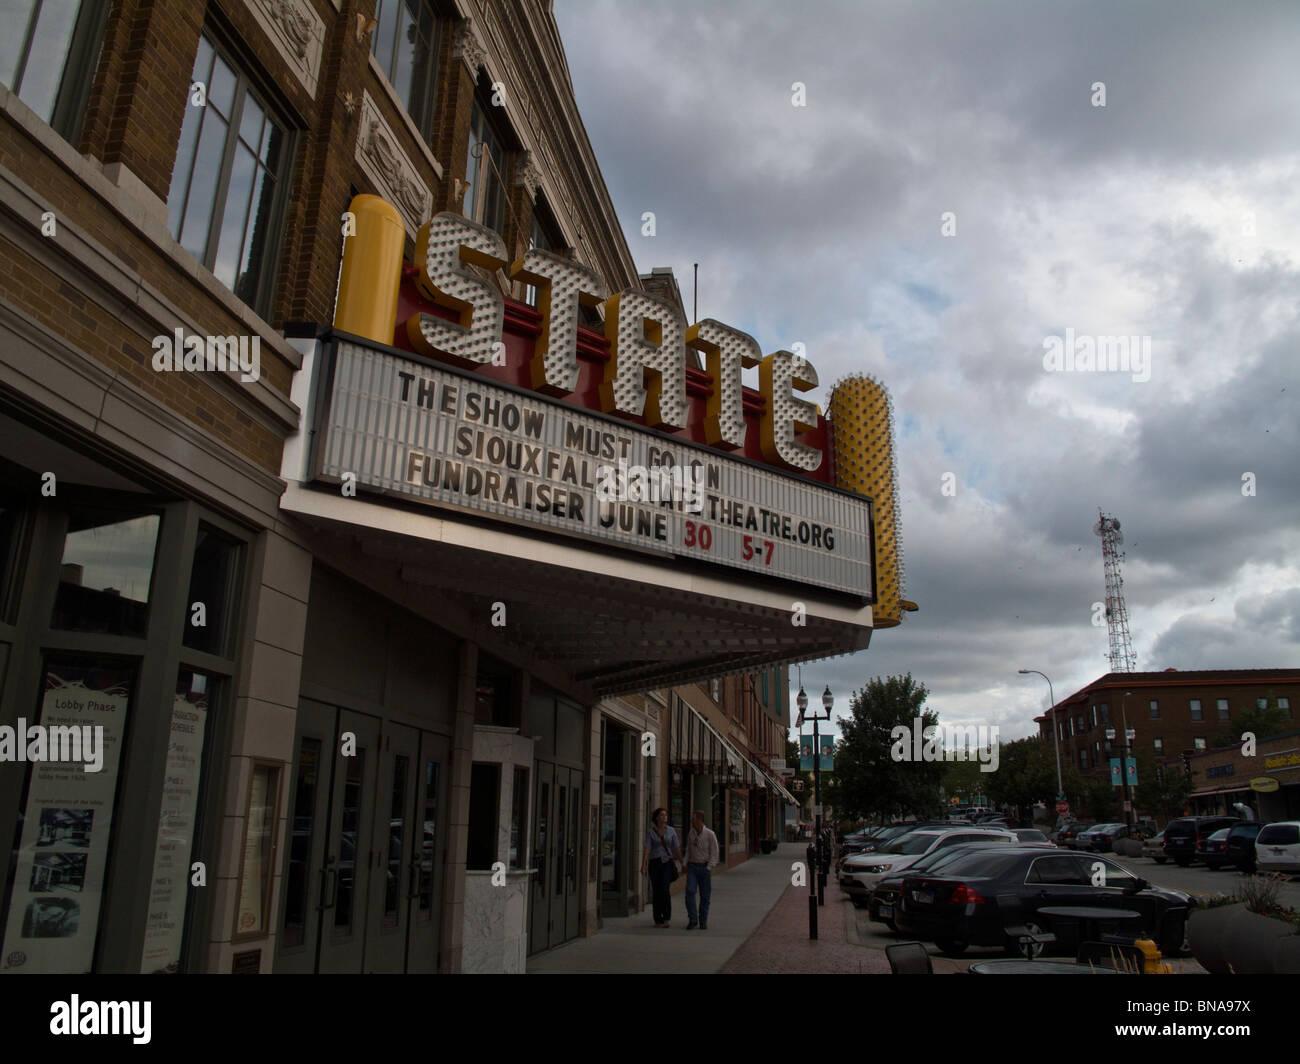 State Theater. Sioux Falls, South Dakota - Stock Image